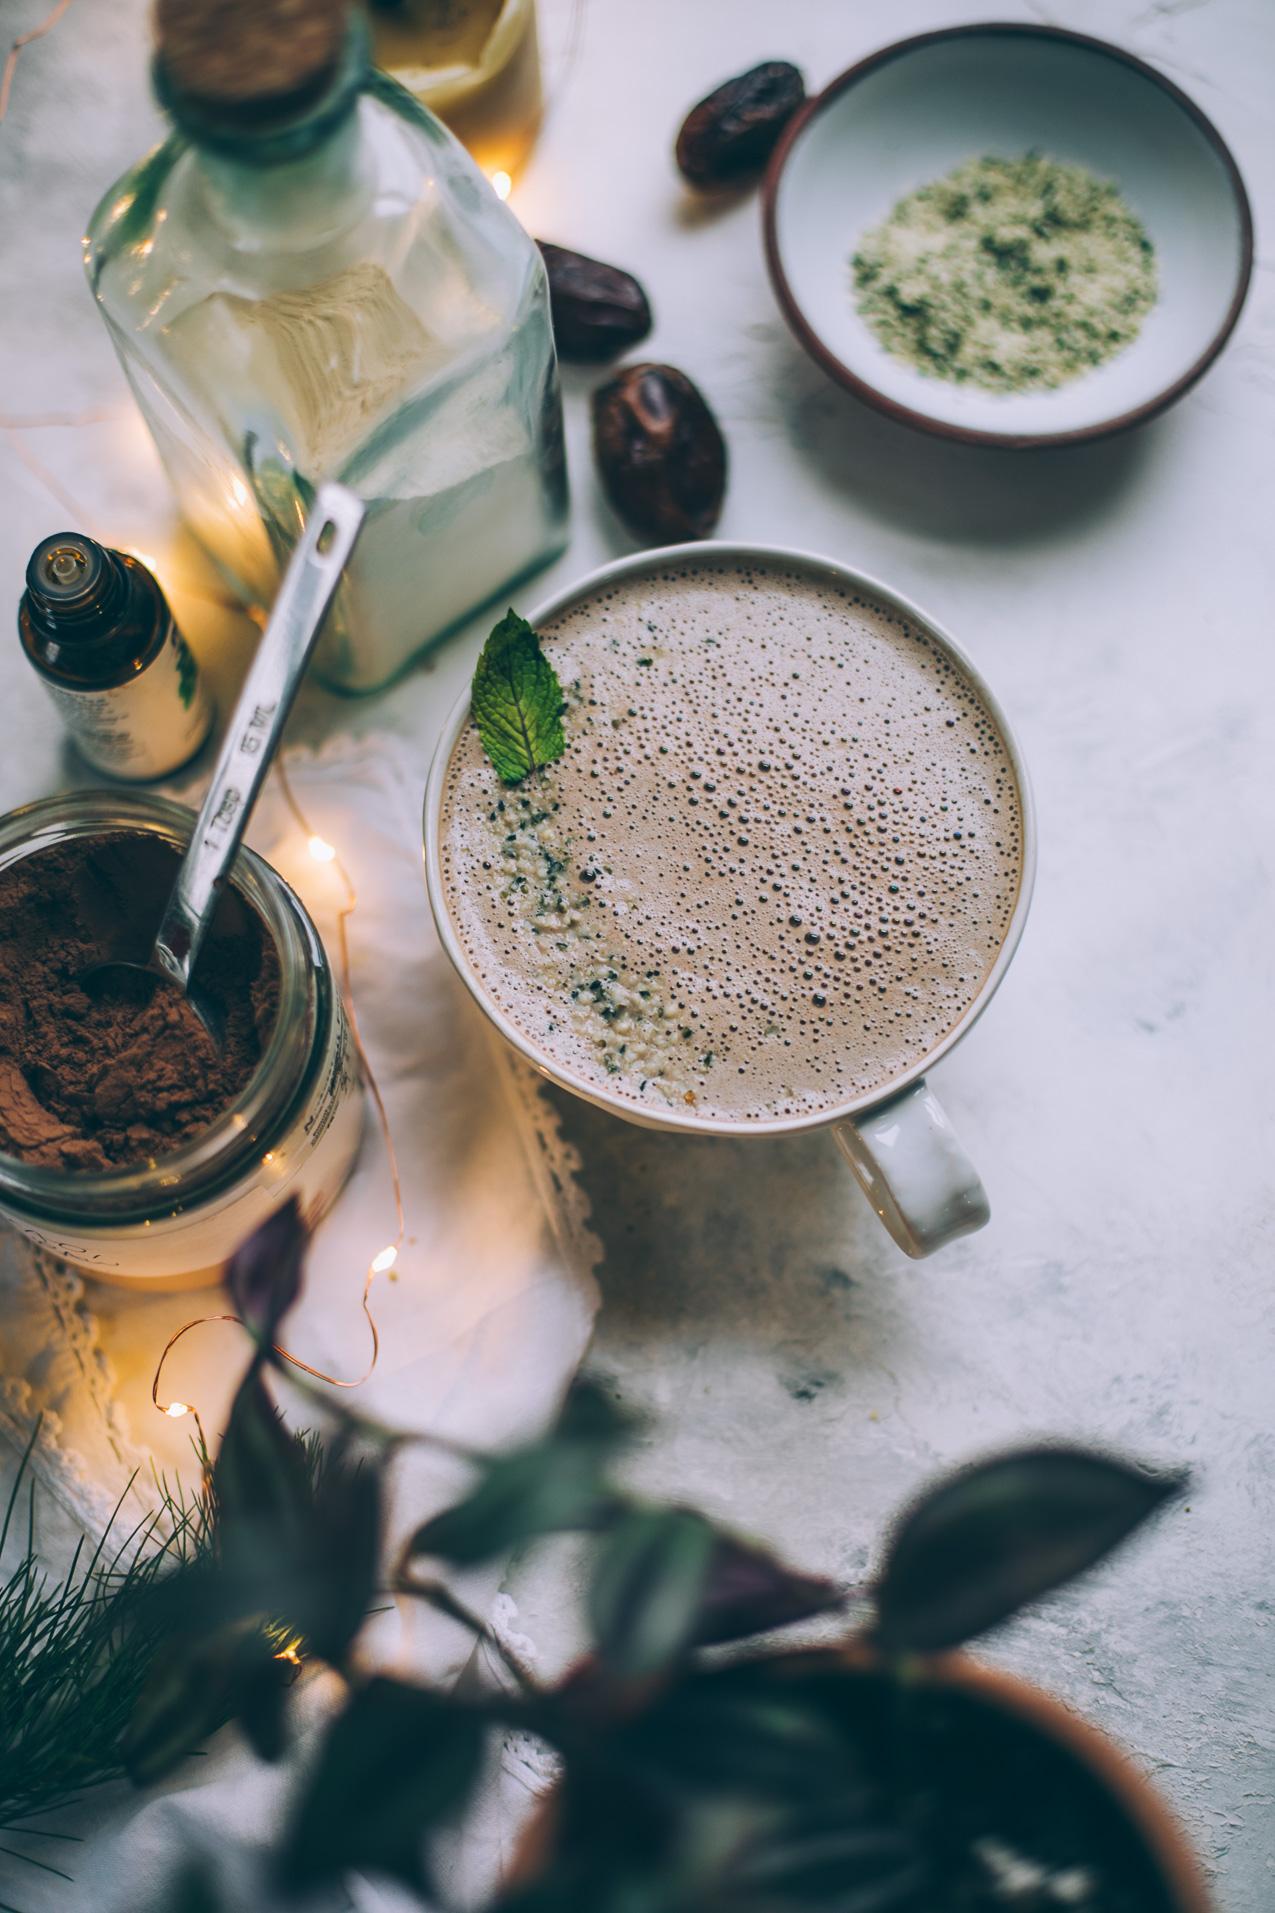 mint-hemp-hot-chocolate-8237.jpg